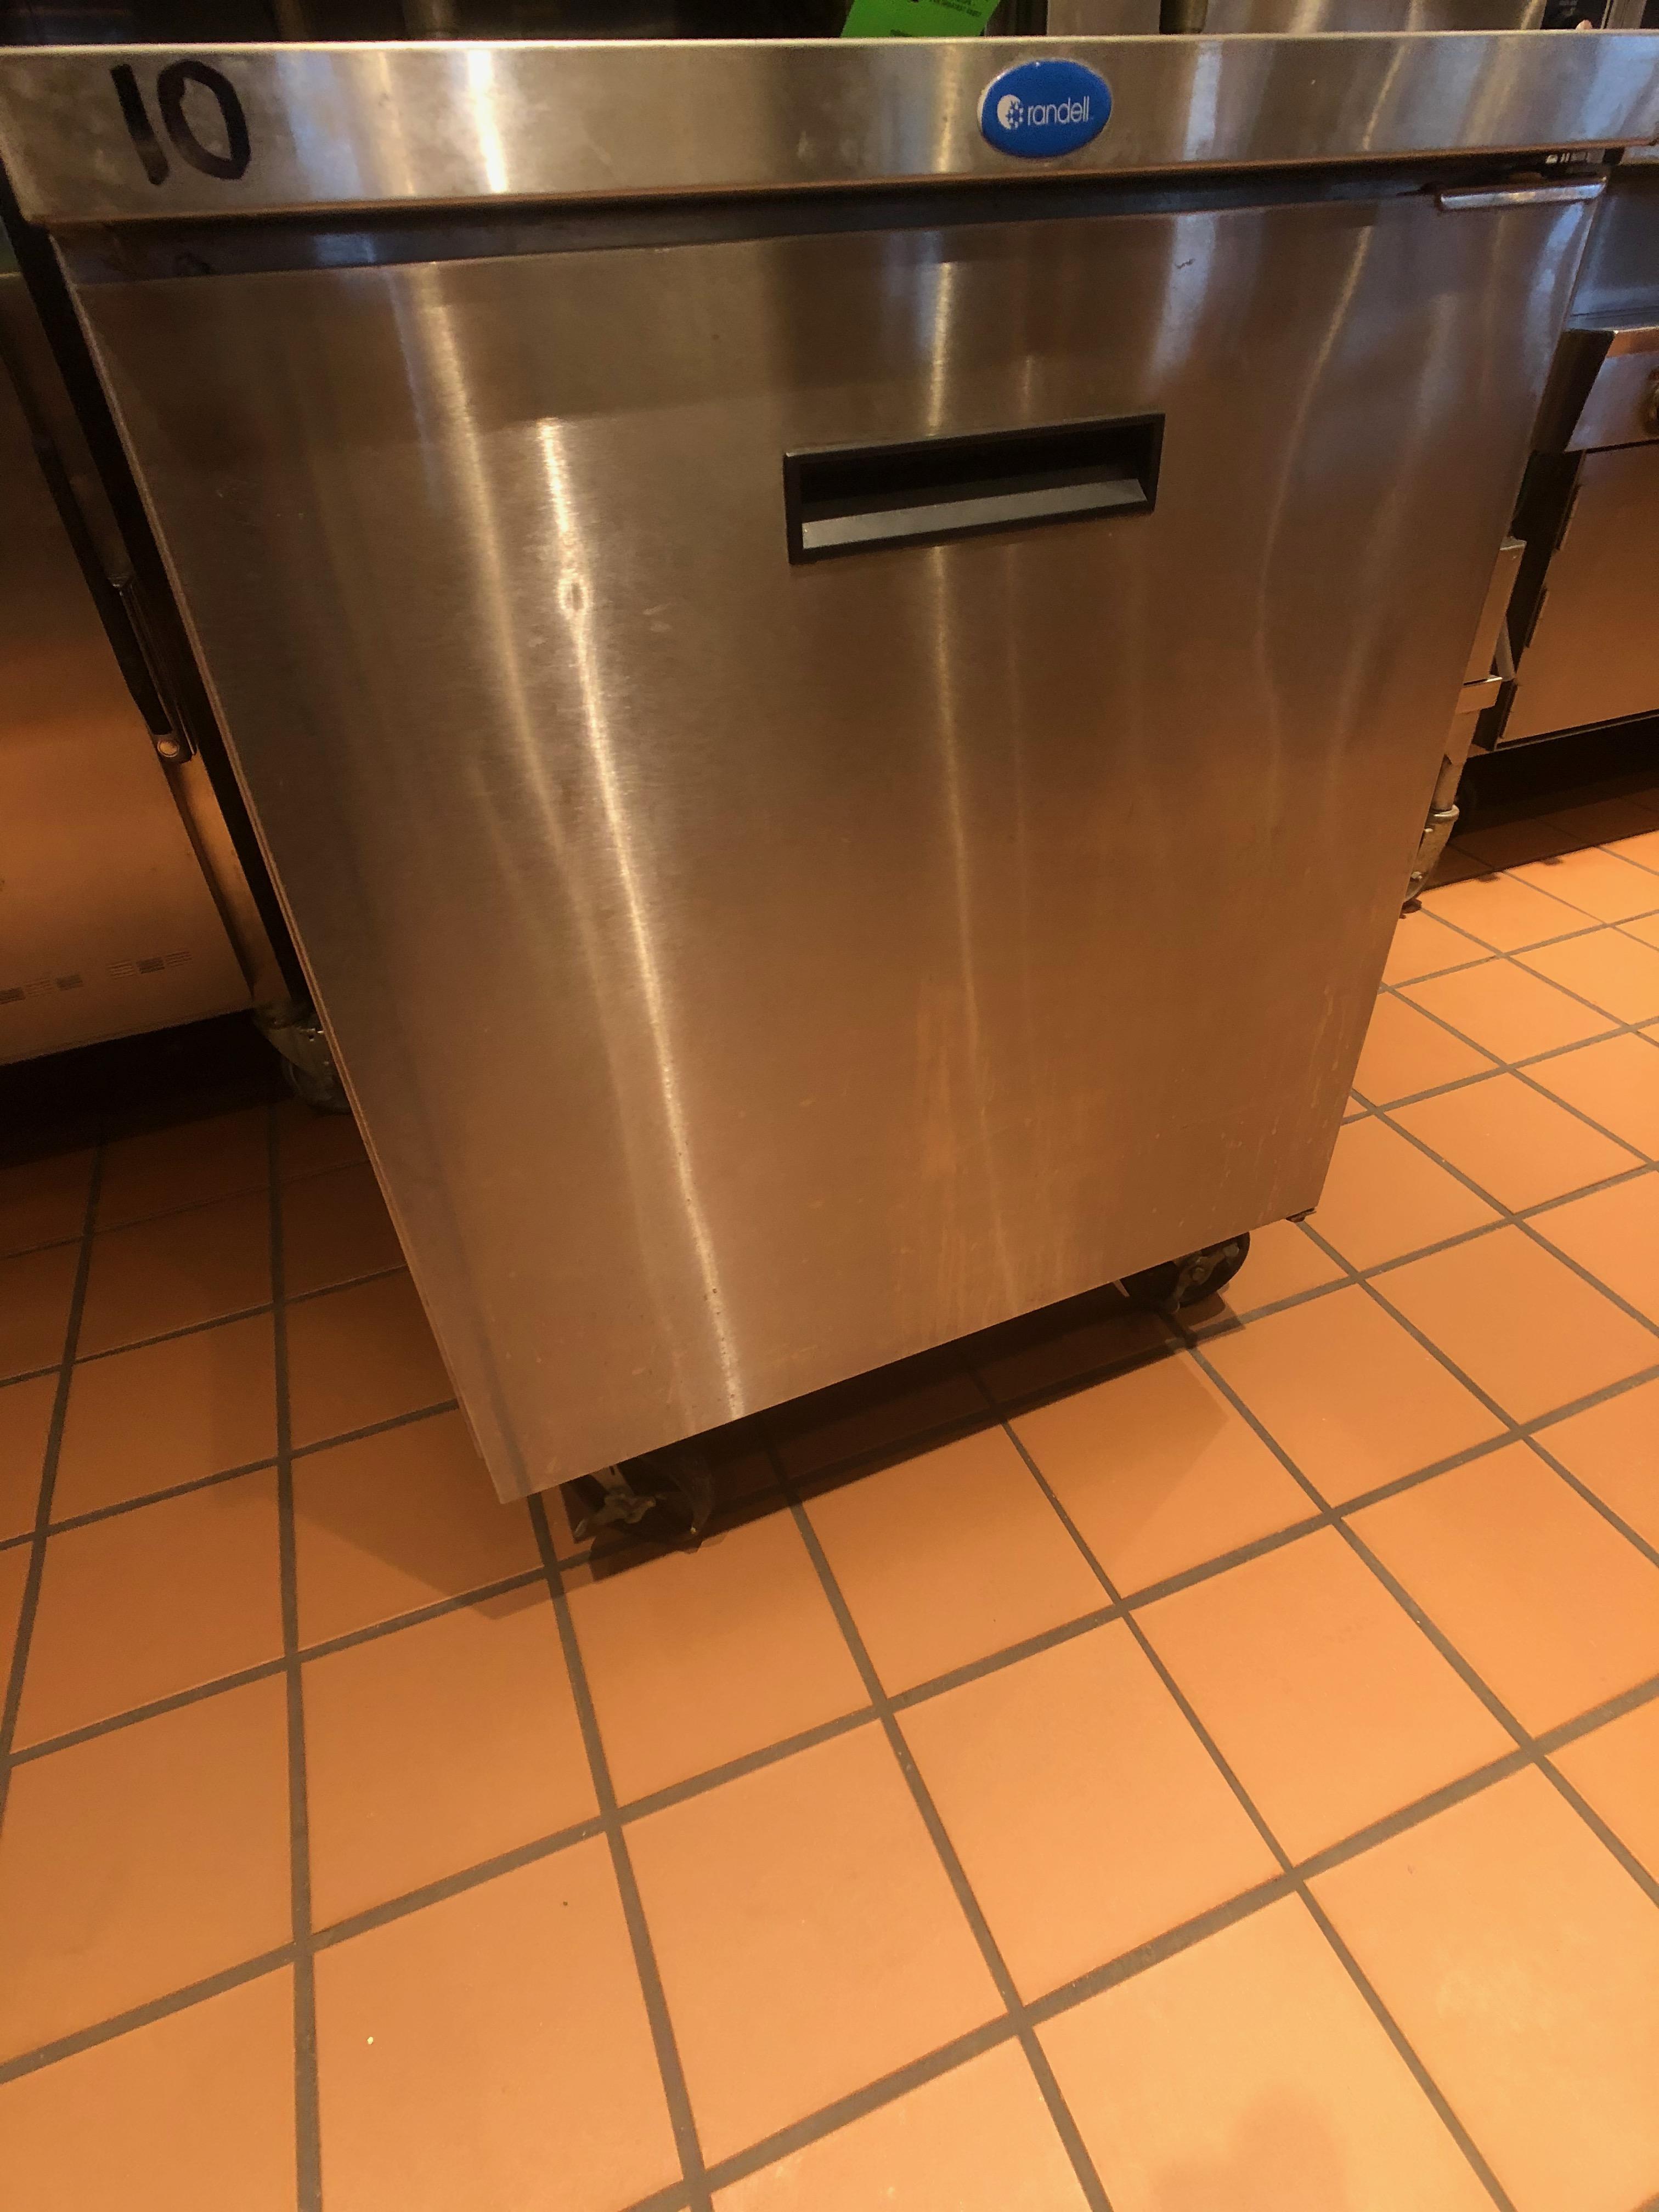 "Randell Single Door Worktop Refrigerator, Model 9402-7, S/N W1041751-1, 27"" W x 30"" D x 36"" H"